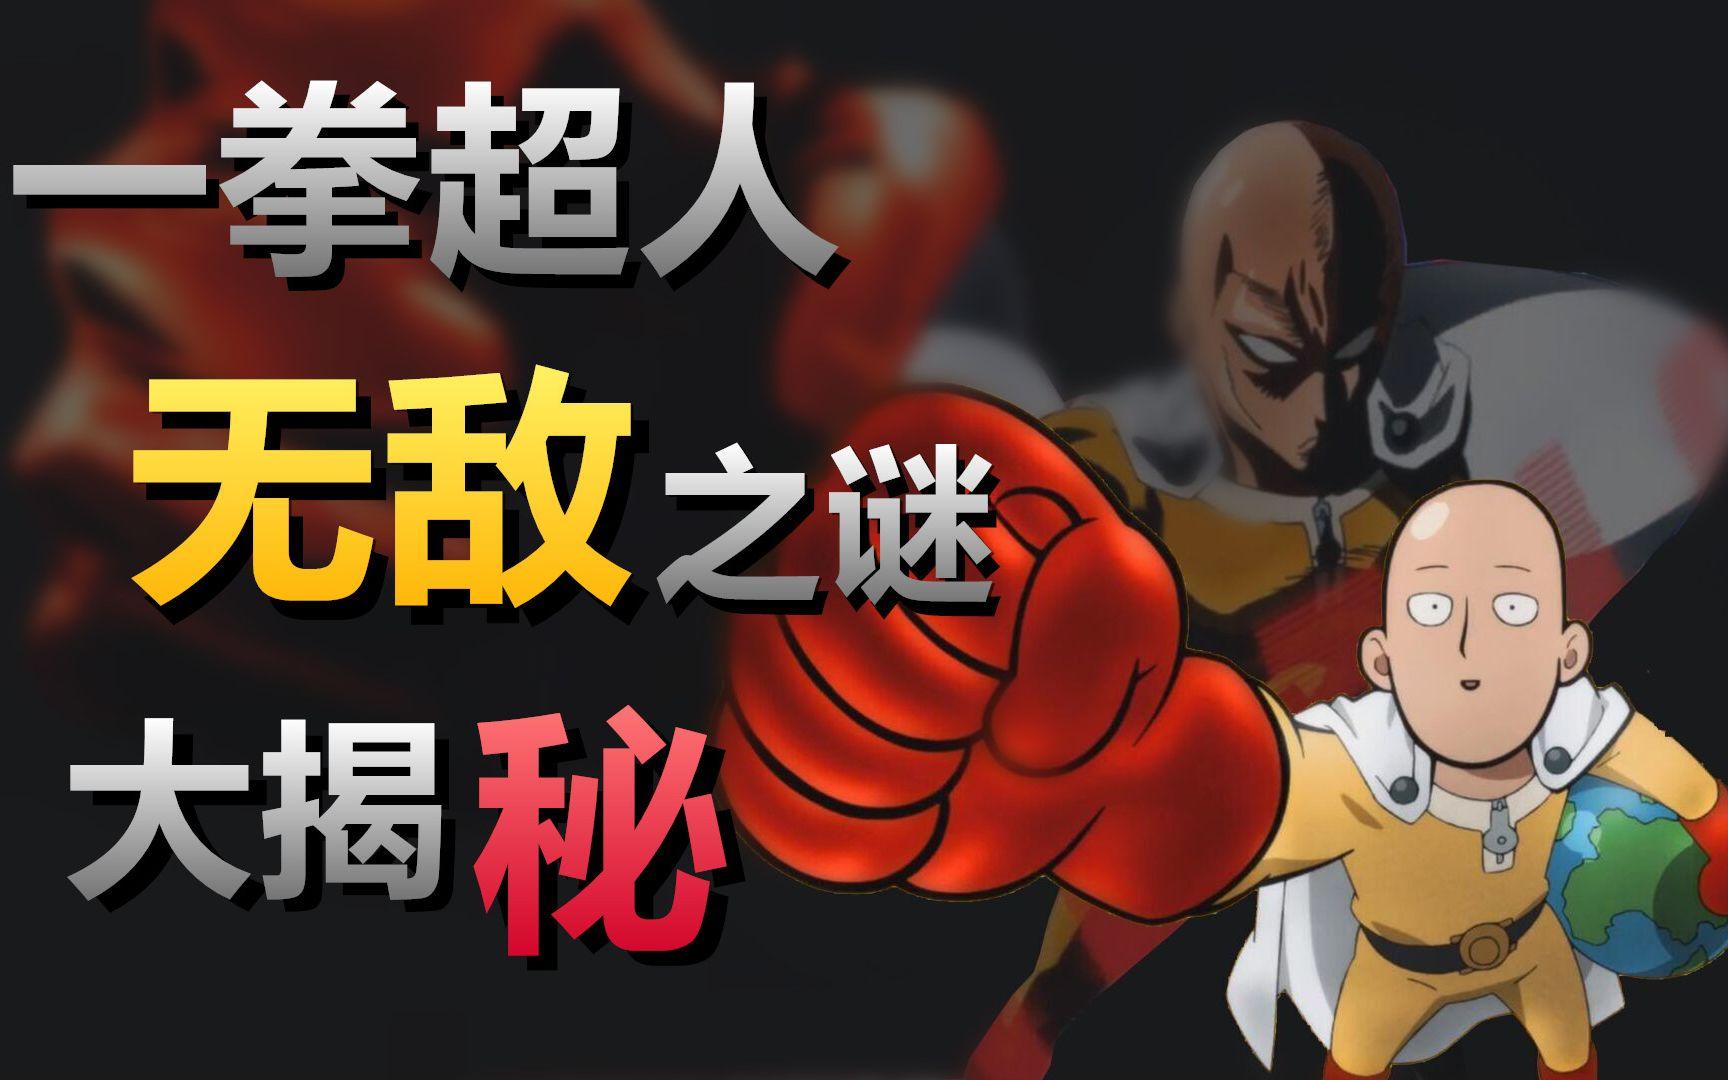 YAYA【一拳超人】崎玉老师原来是这么变强的?